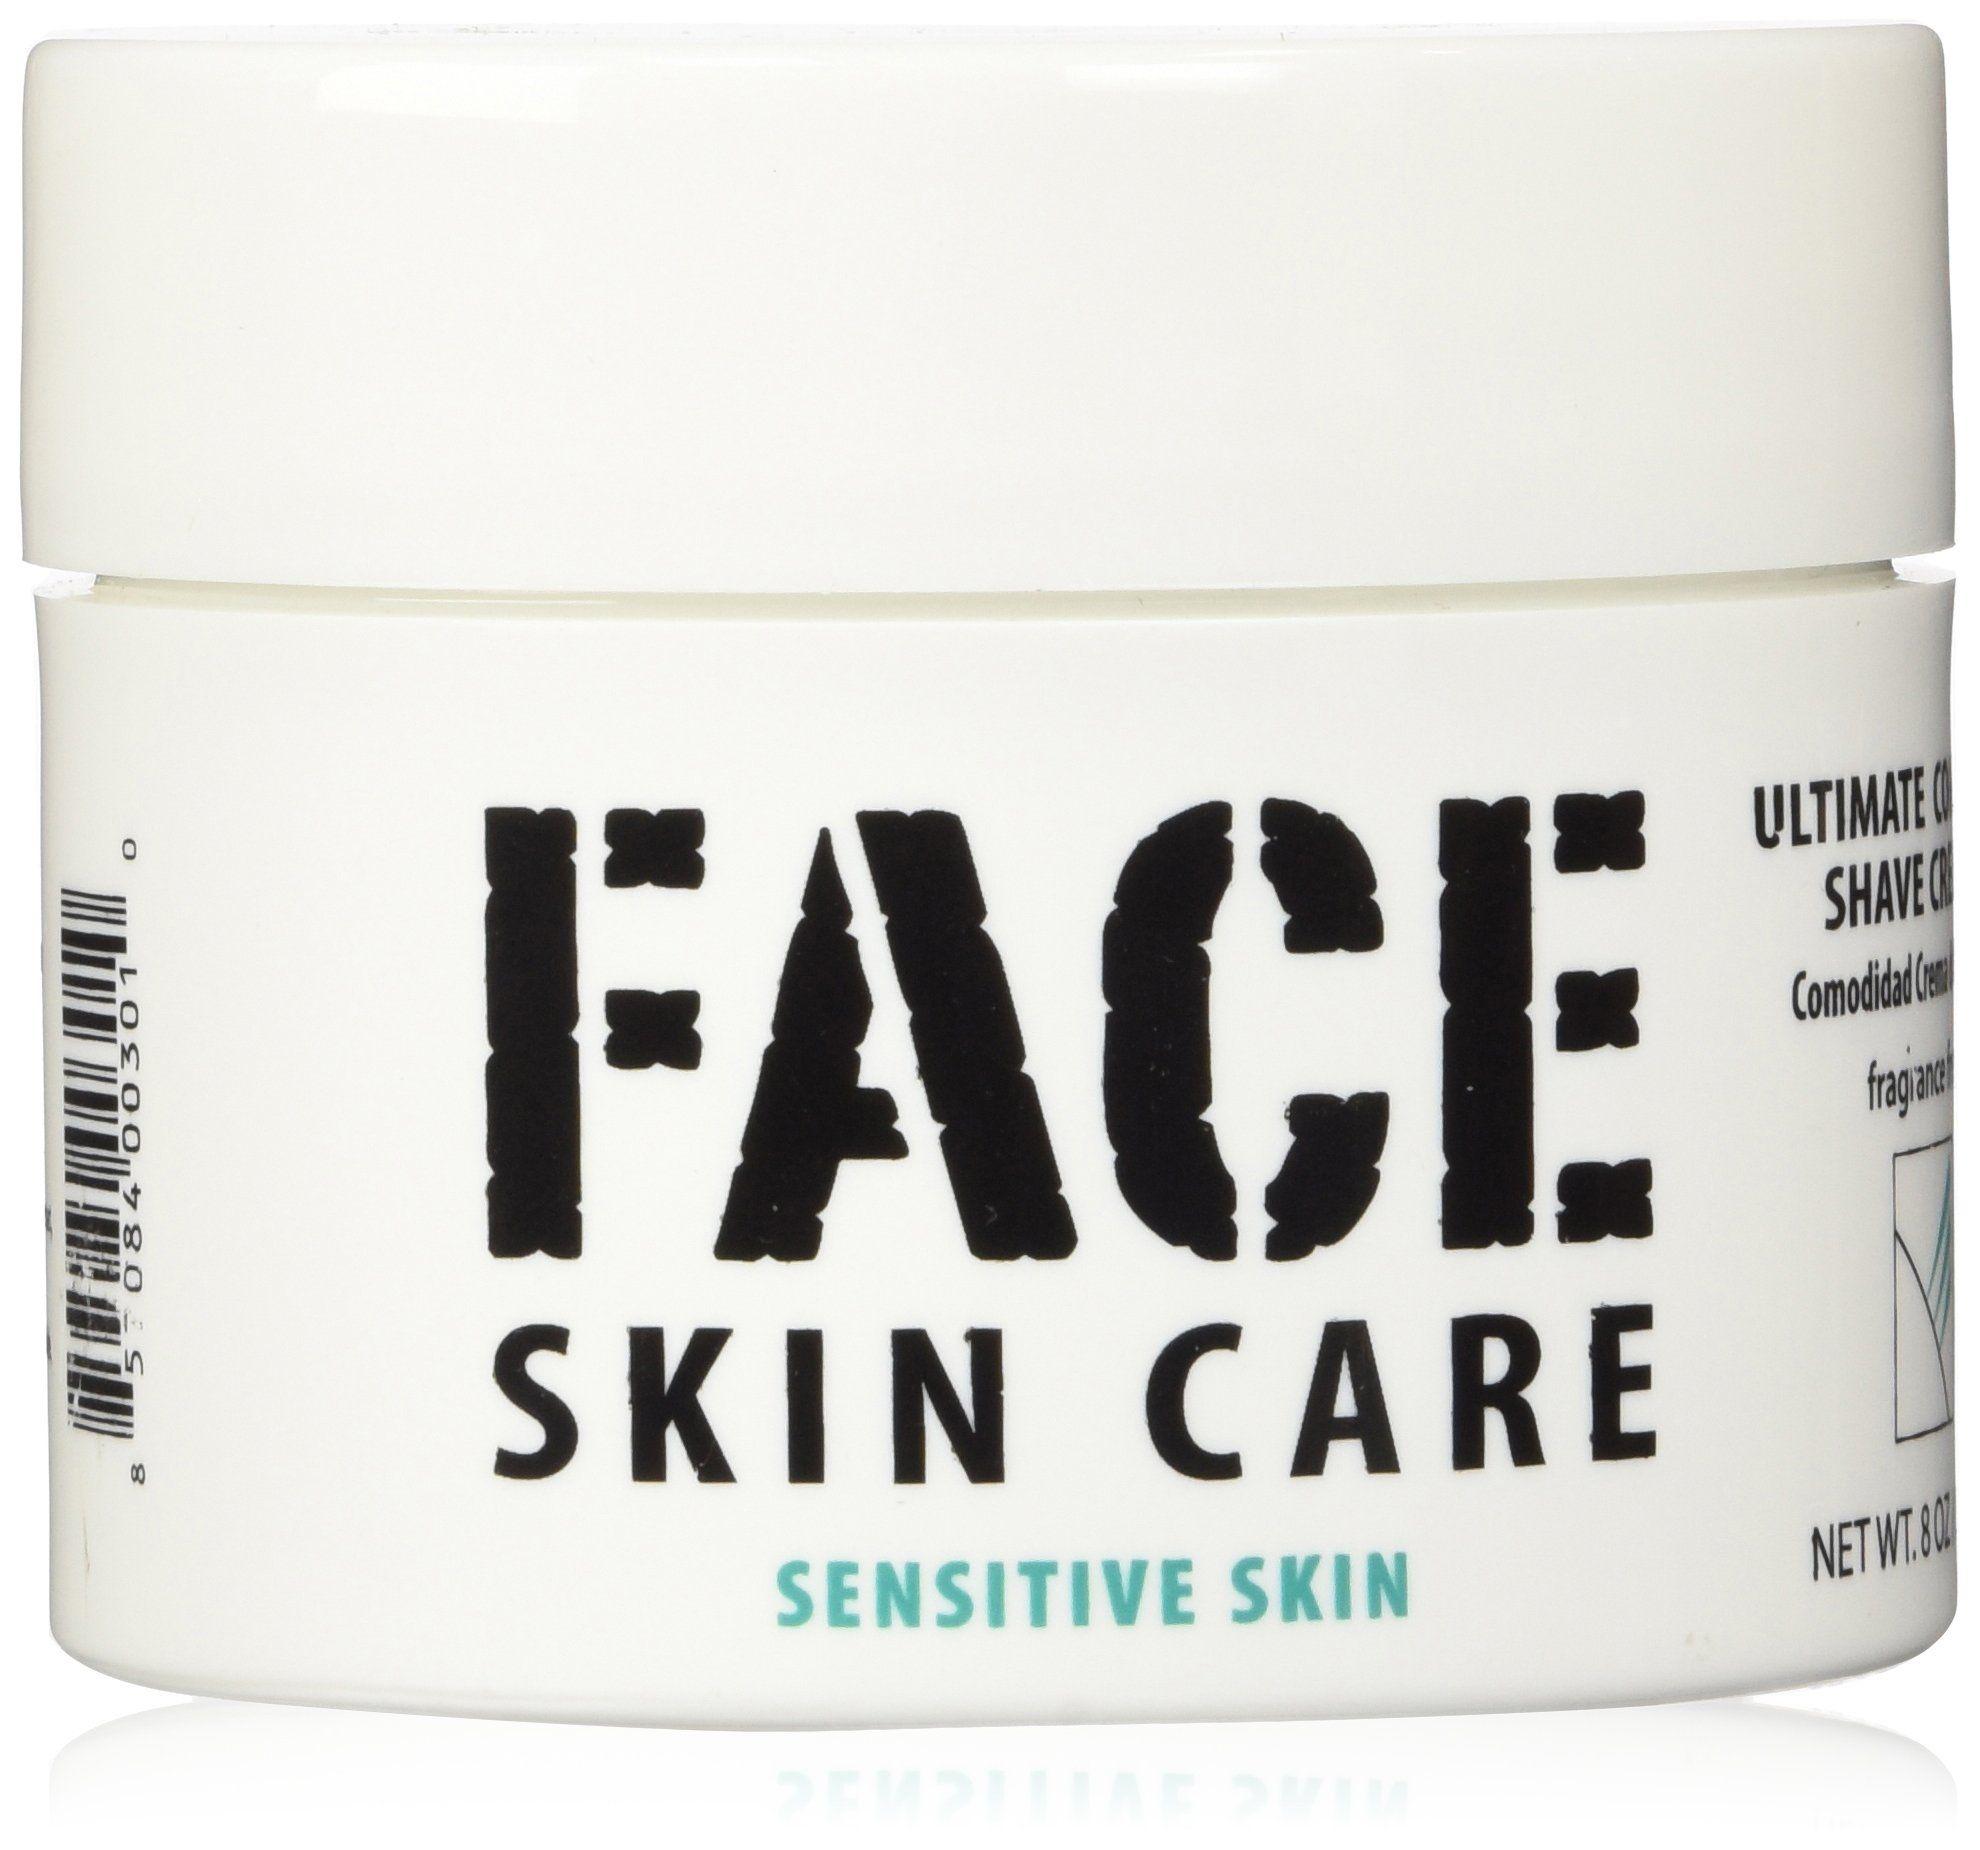 Ultimate Comfort Shaving Cream For Sensitive Skin Lab Series Alternative 8 Oz Jar Be Sure To Check Out This Awe Sensitive Skin Shaving Cream Face Skin Care